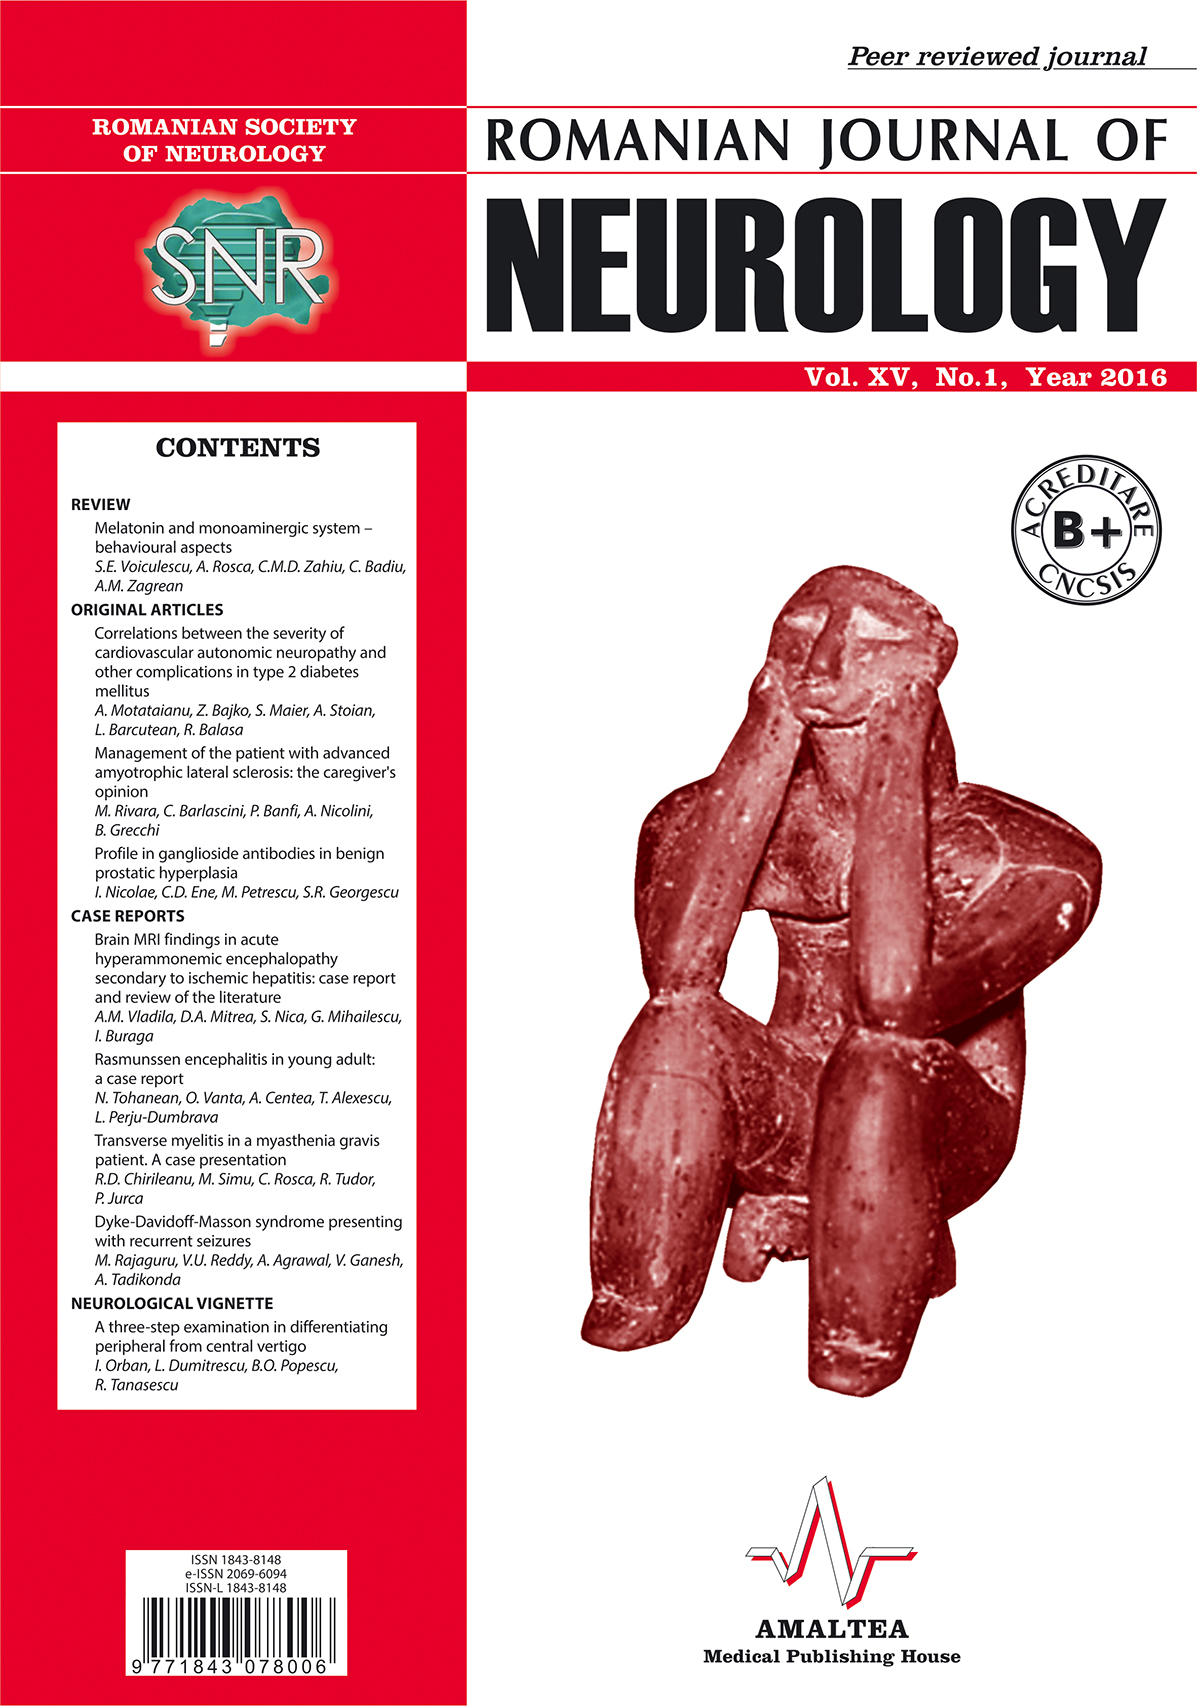 Romanian Journal of Neurology, Volume XV, No. 1, 2016